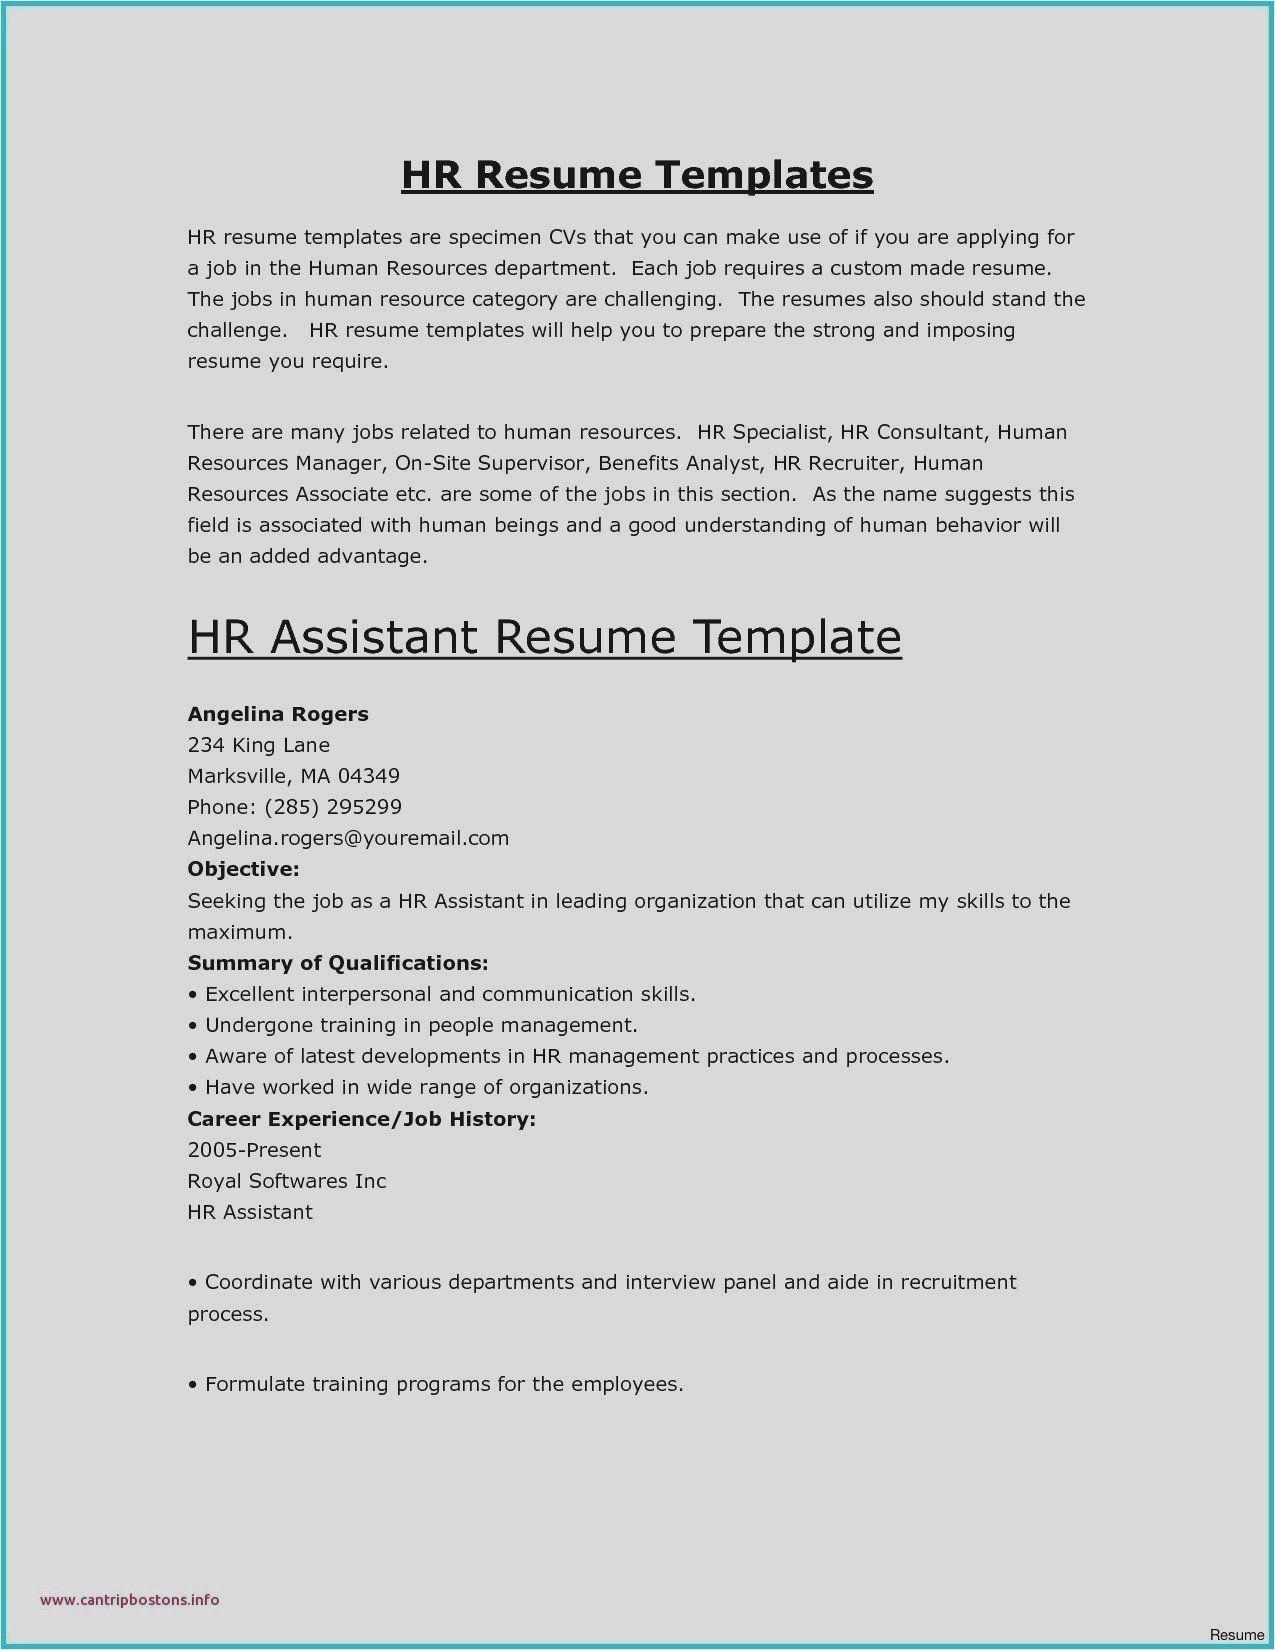 Computer Technician Resume Skills Lovely Puter Technician Resume Sample Pdf New Curriculum Vitae